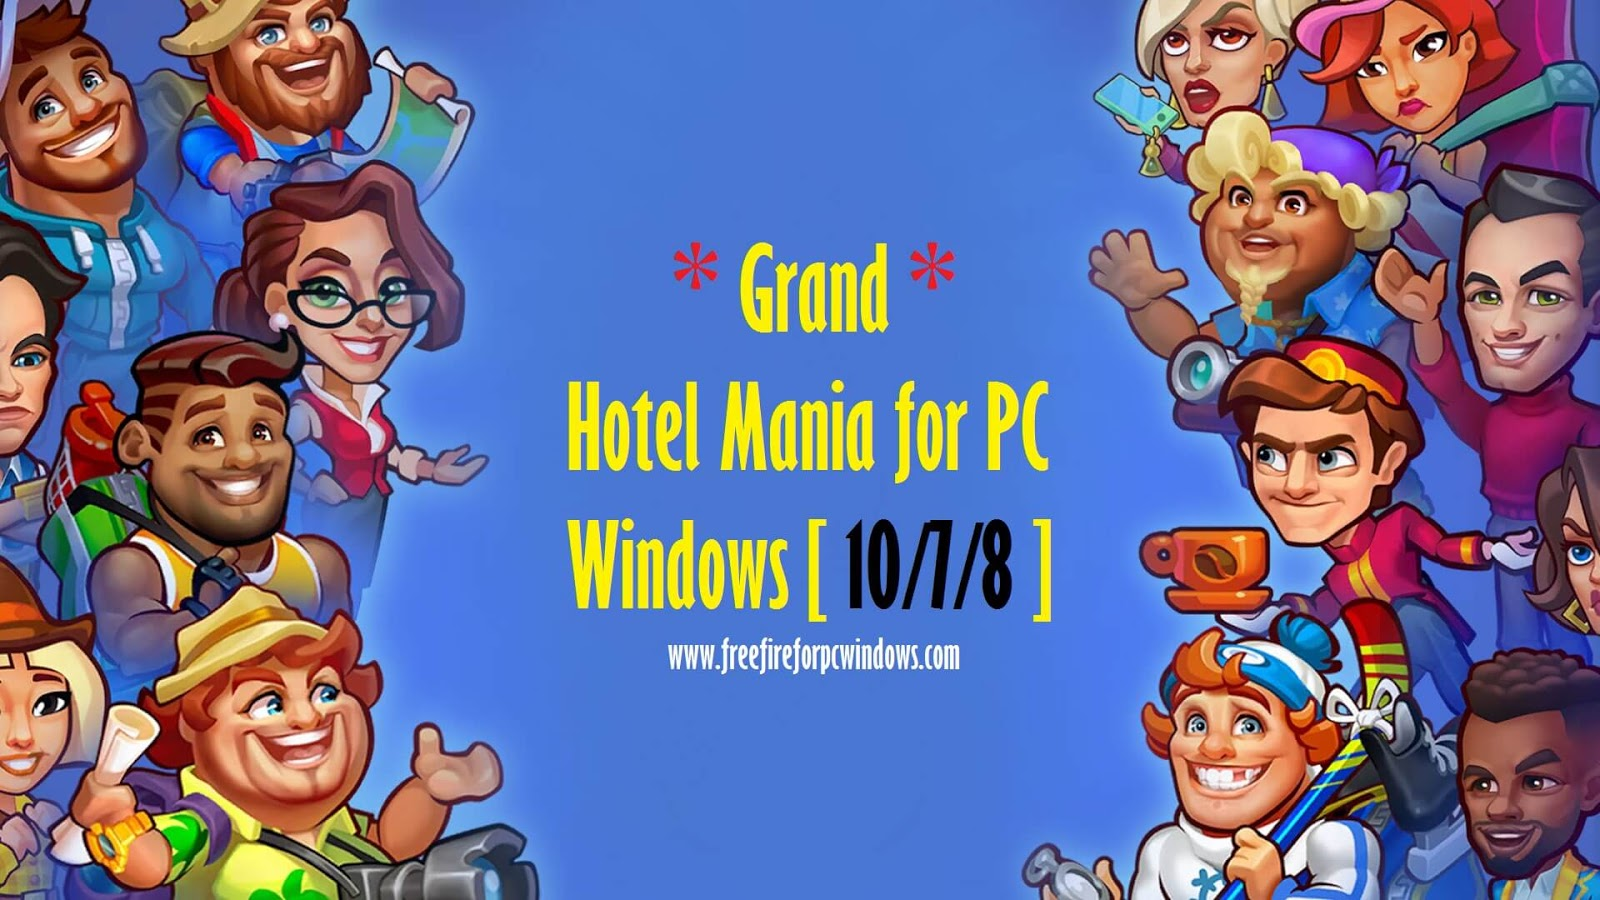 Grand Hotel Mania for PC Windows